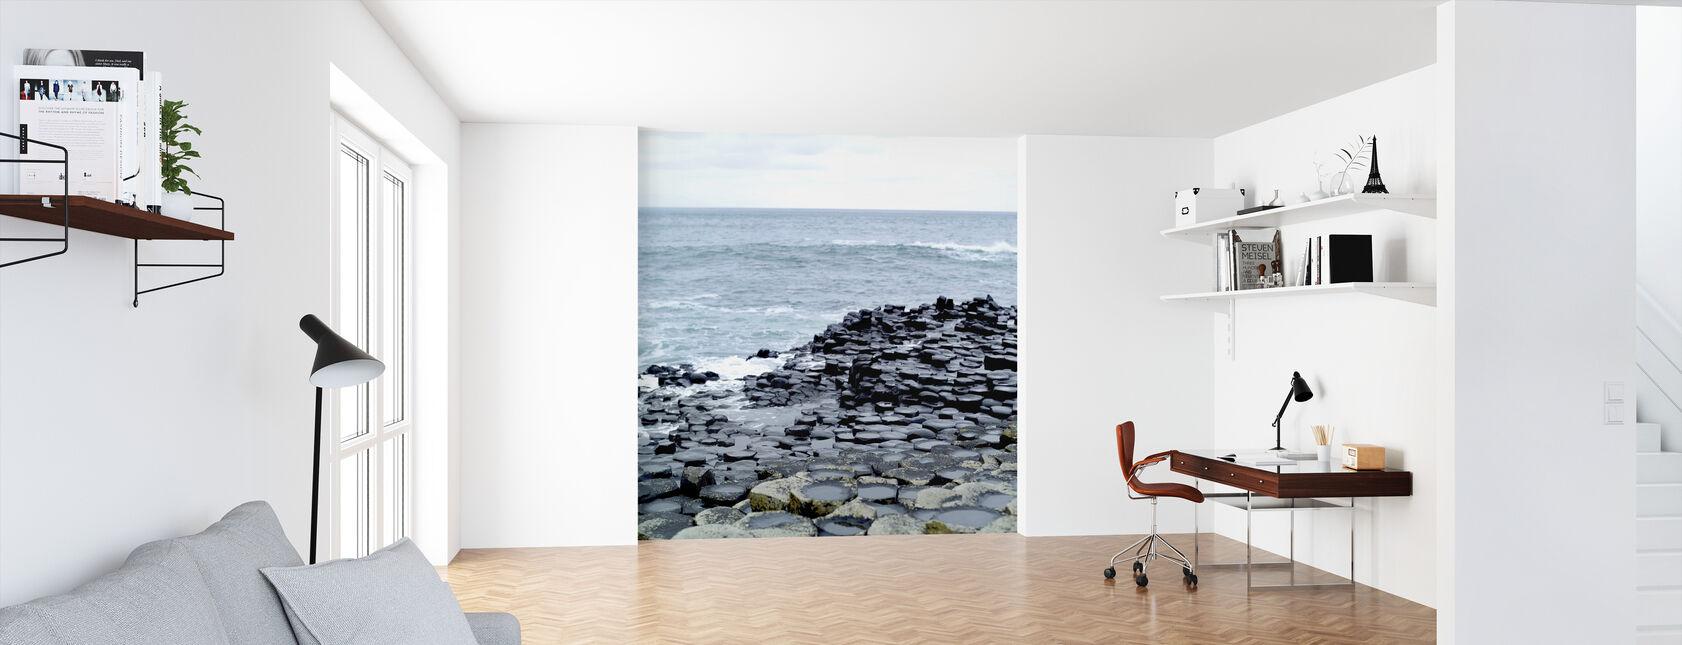 Giants Causeway in Antrim - Wallpaper - Office